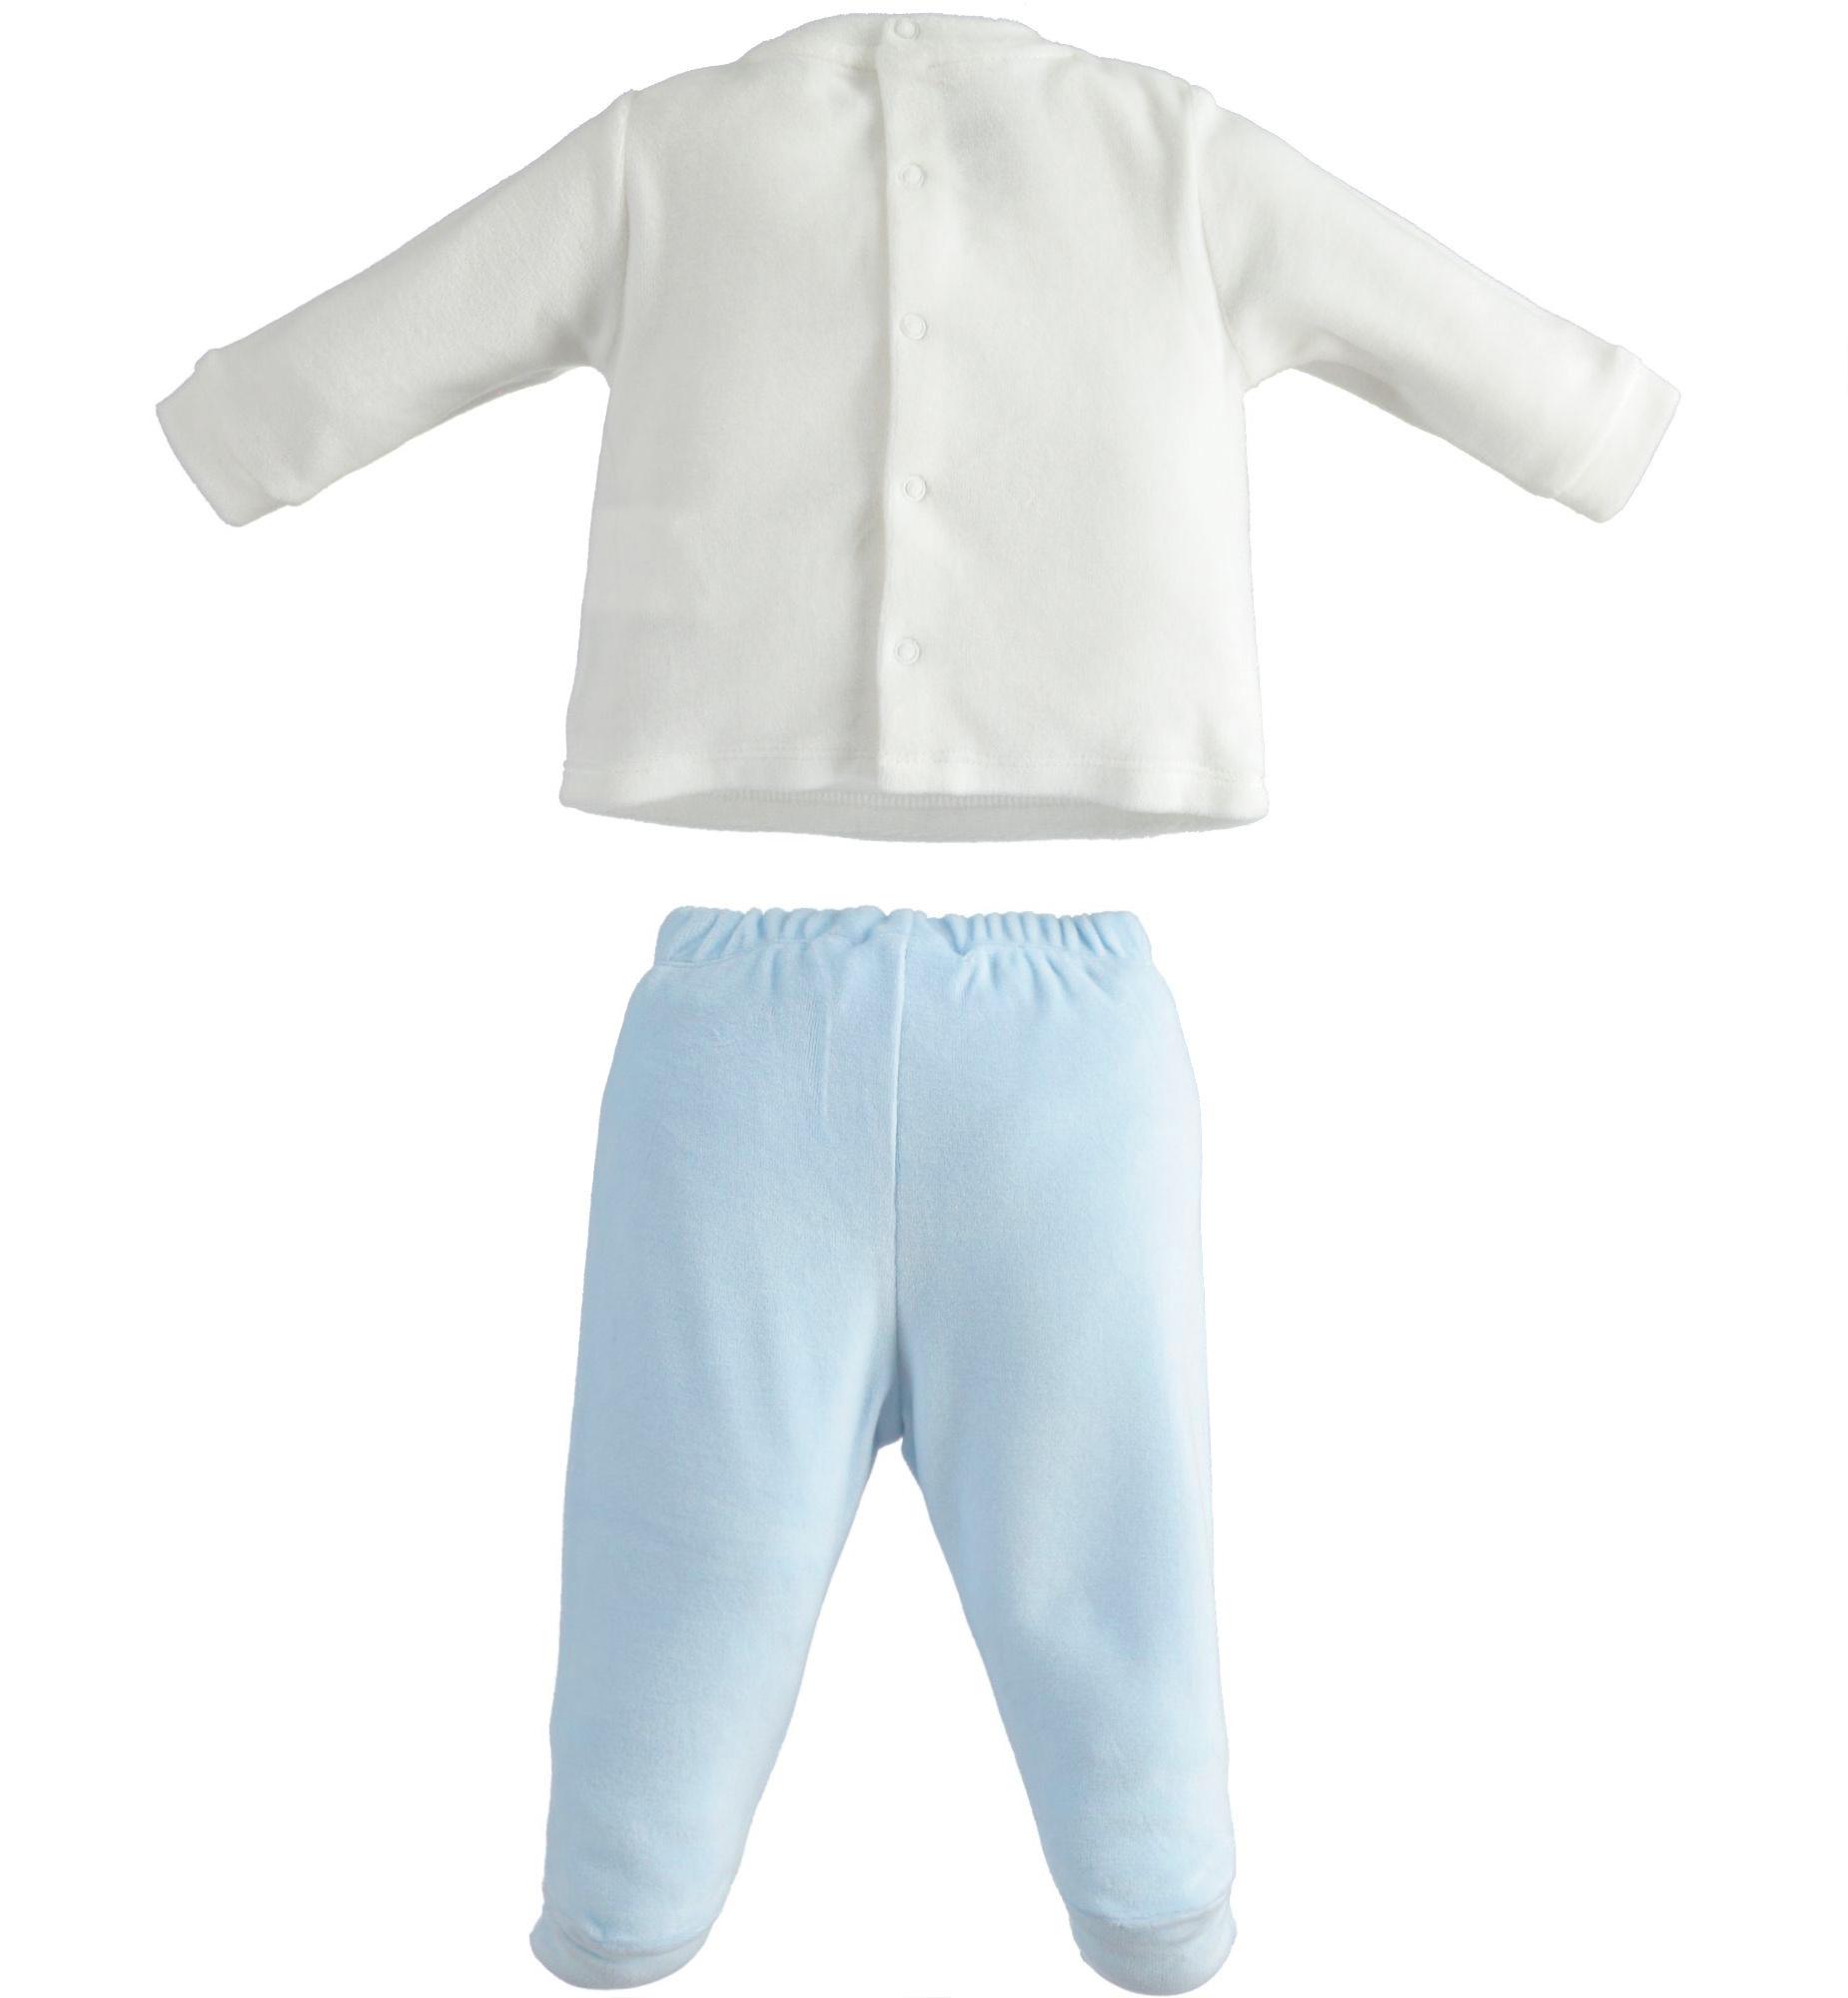 Ido iDO Blue and White Velour Two Piece - 43150